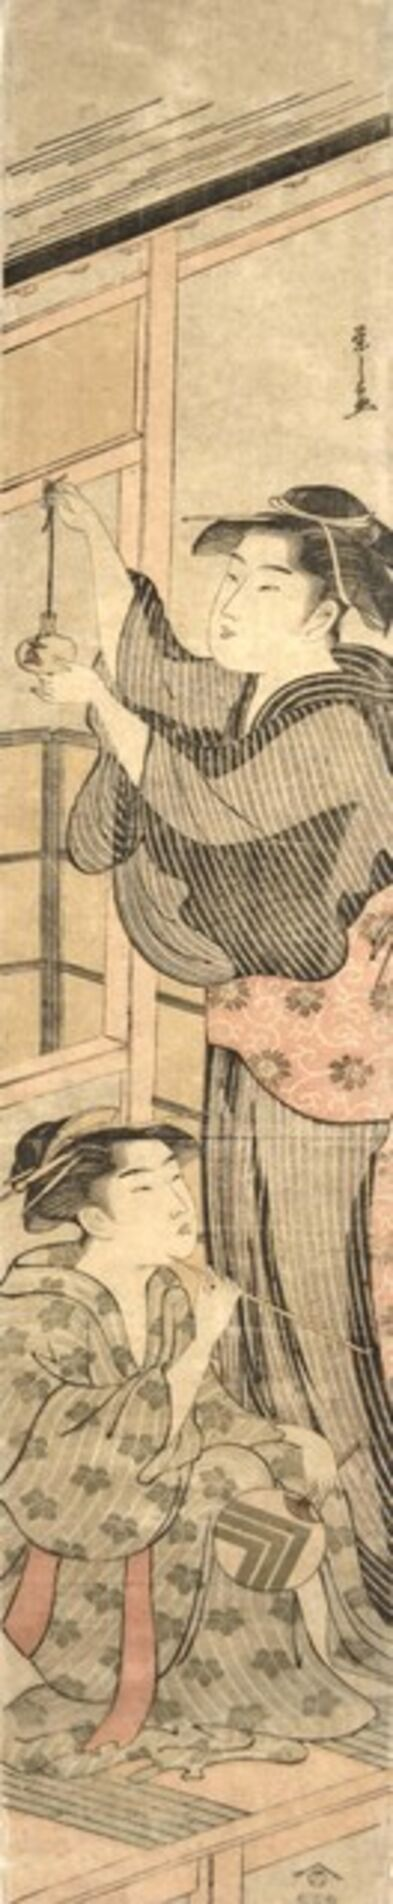 Hosoda Eishi, 'Bijin in a Summer Kimono Holding a Goldfish Bowl', ca. 1790